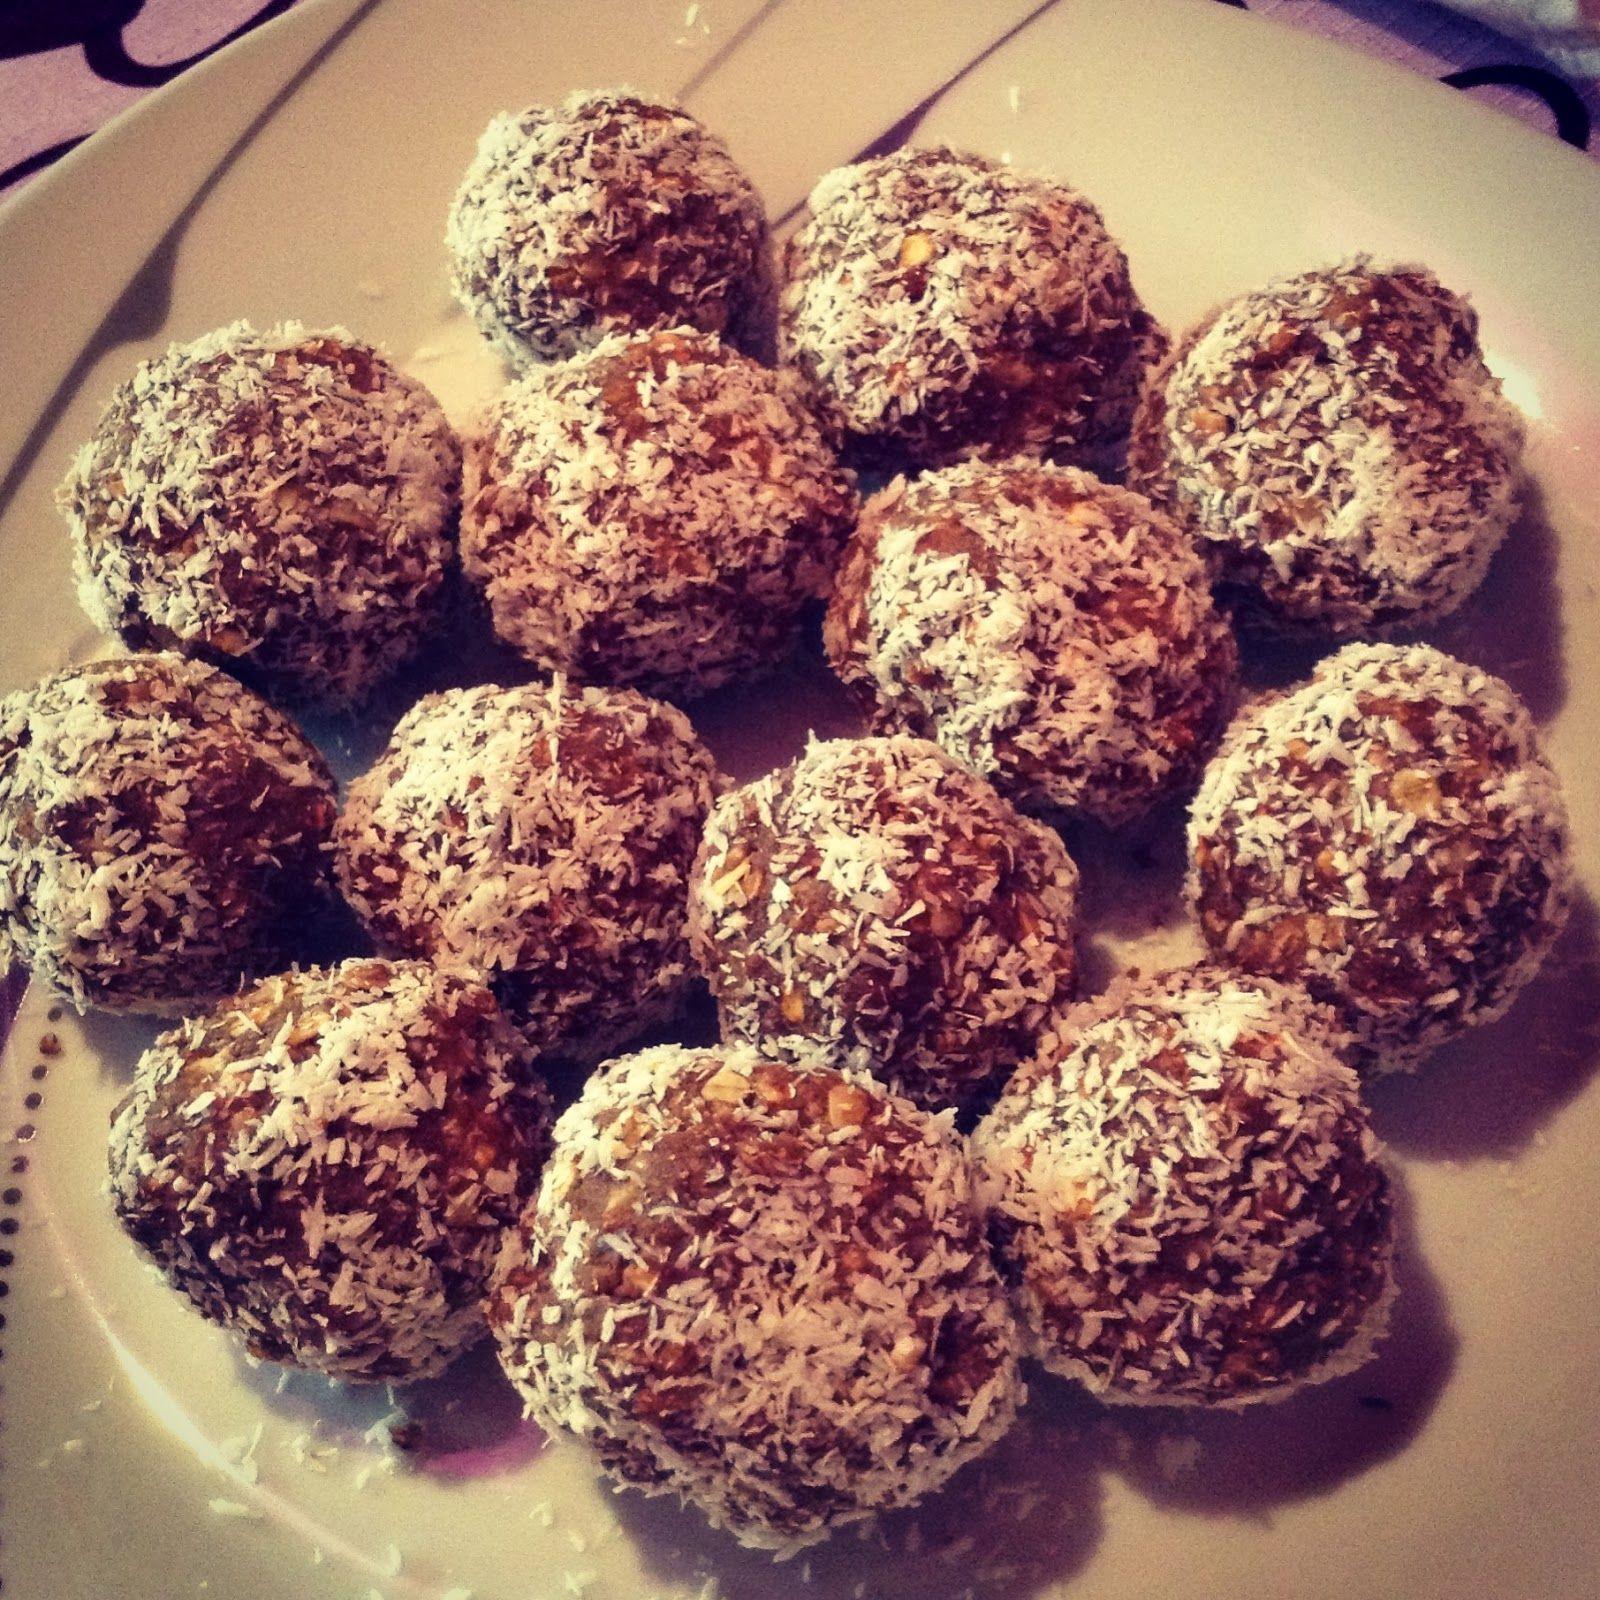 čokoládové guľôčky